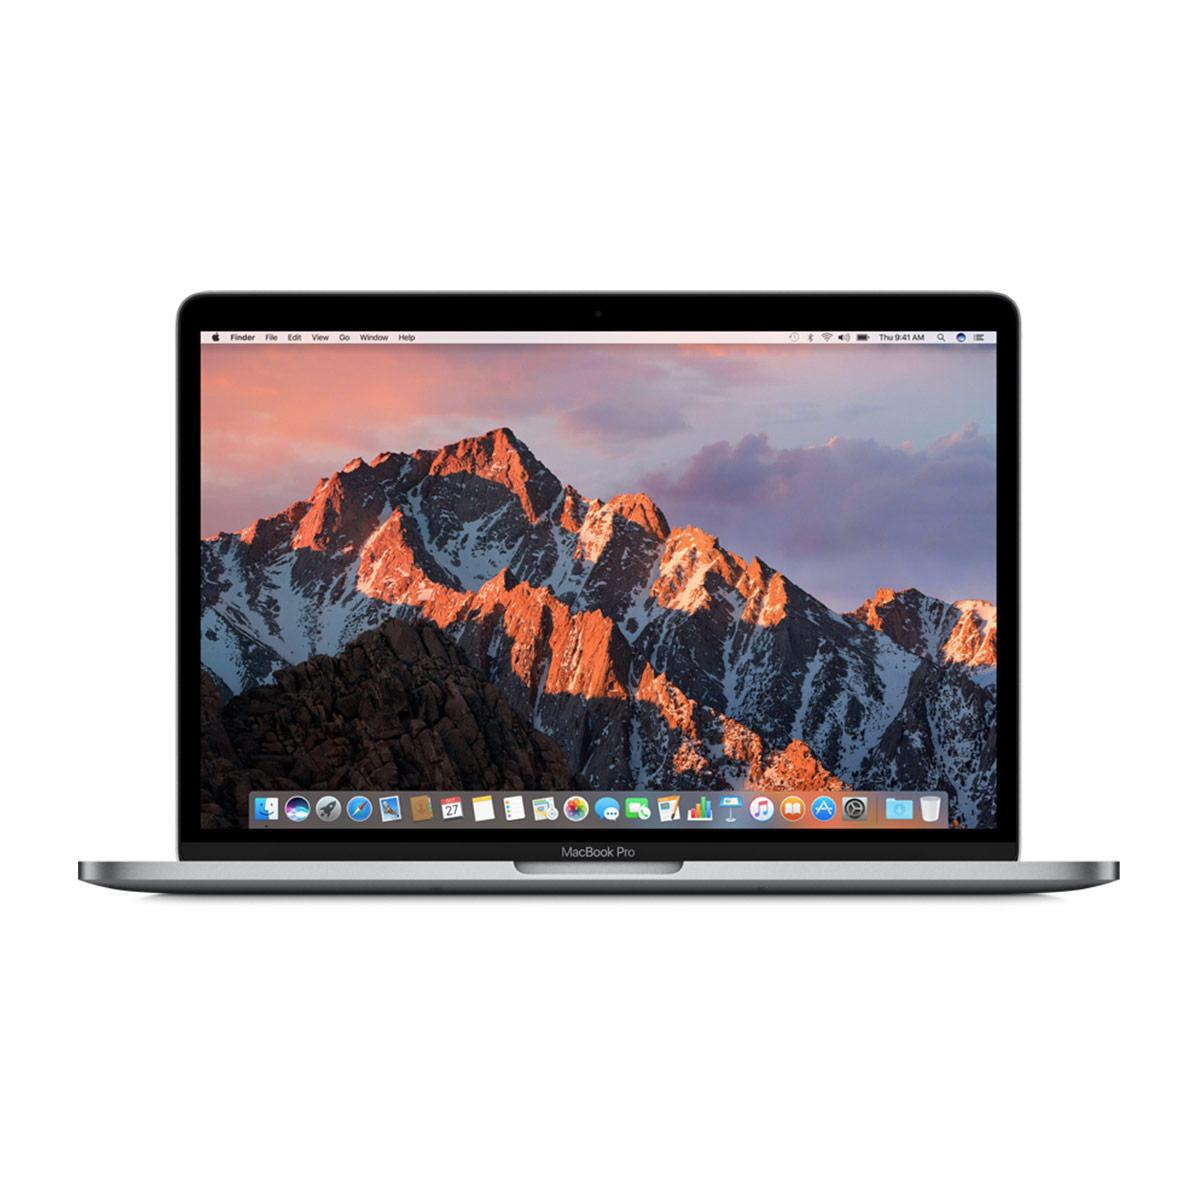 "MacBook Pro 15"" TouchBar 6-core i9 2.9GHz 32GB 1TB 560X Space Grey"